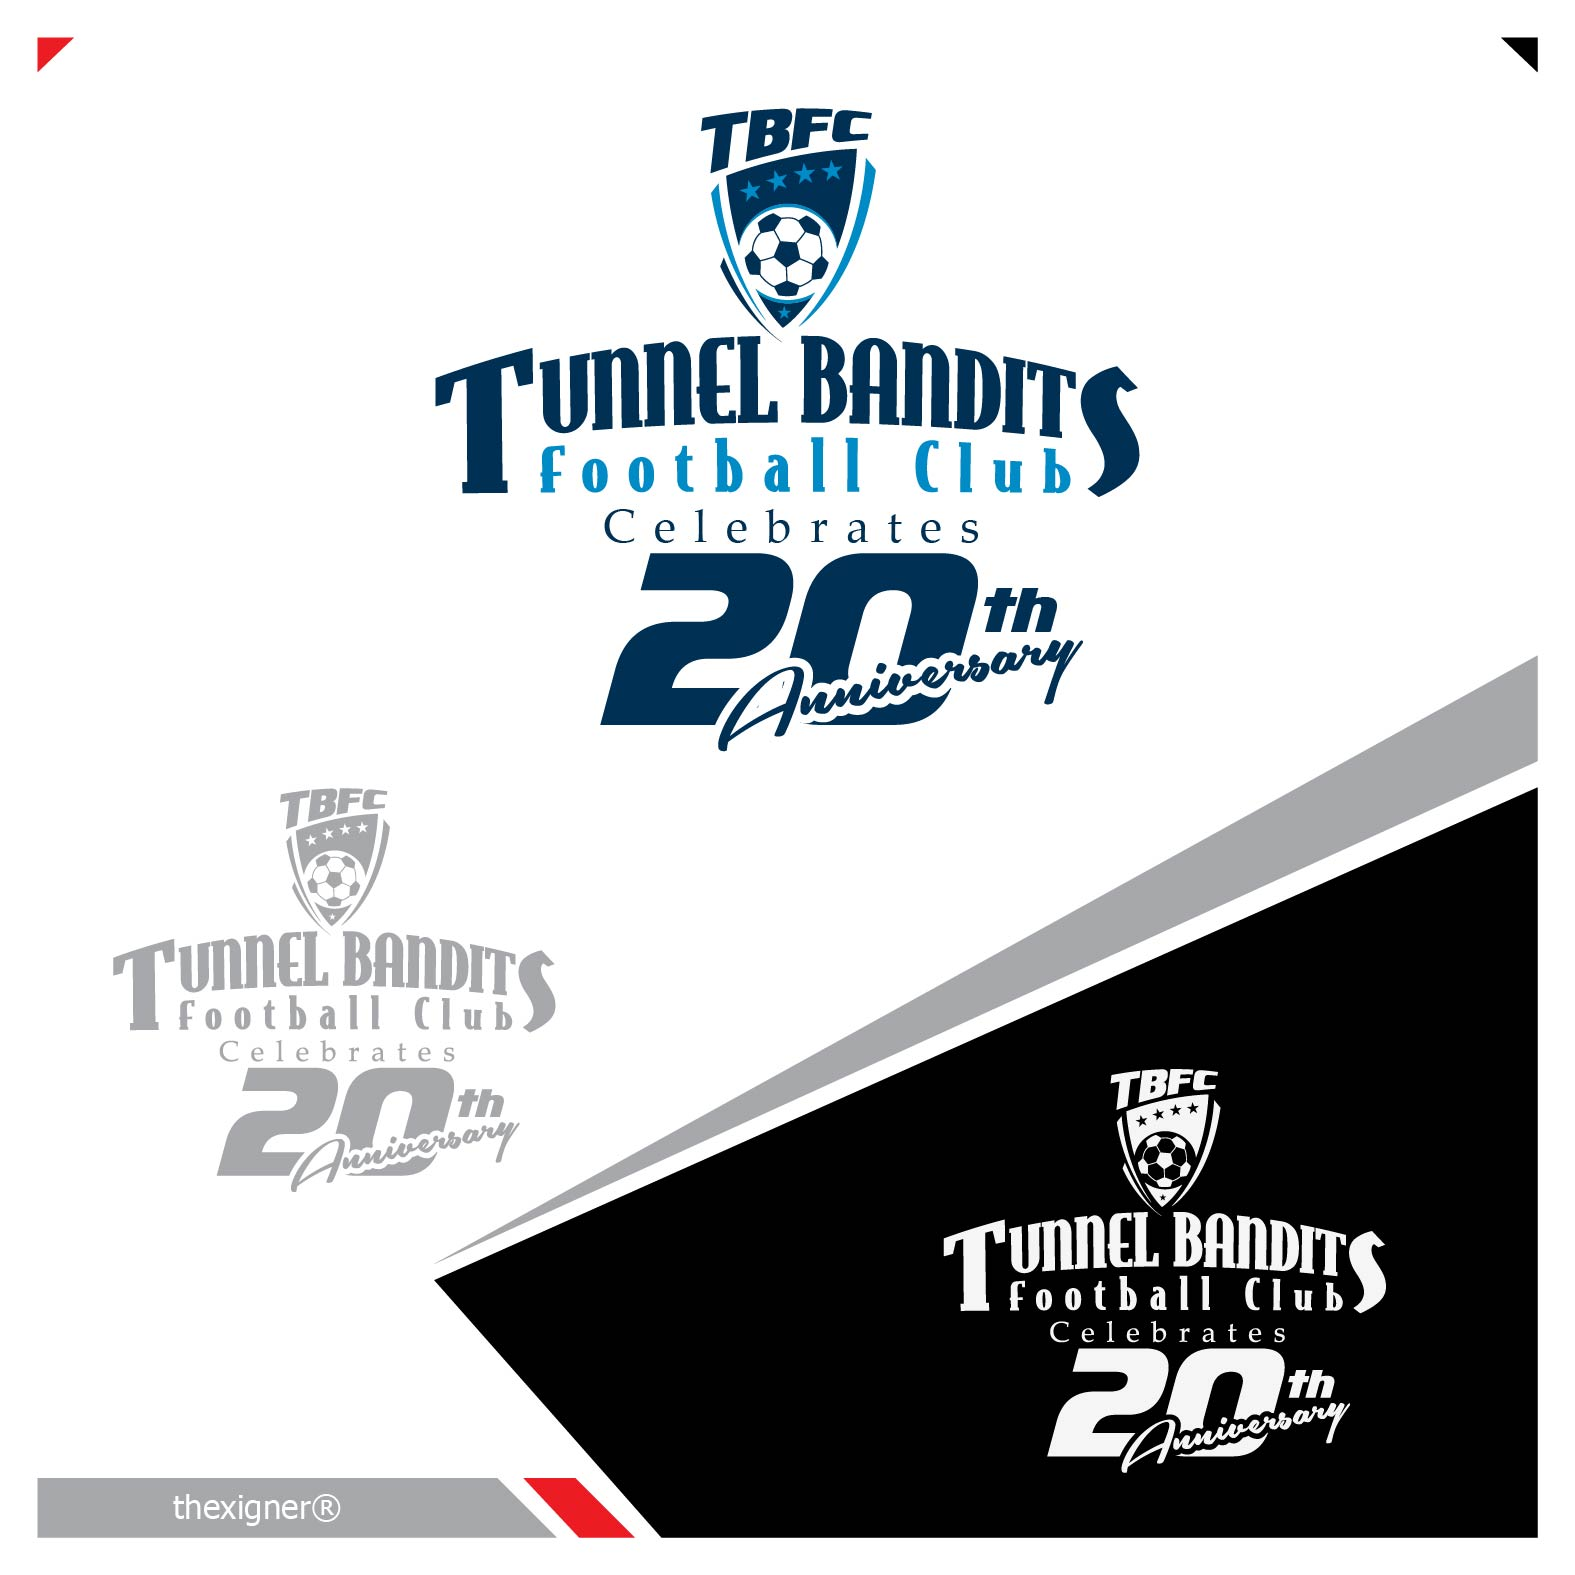 Logo Design by lagalag - Entry No. 6 in the Logo Design Contest Tunnel Bandits Football Club (TBFC) Logo Design.